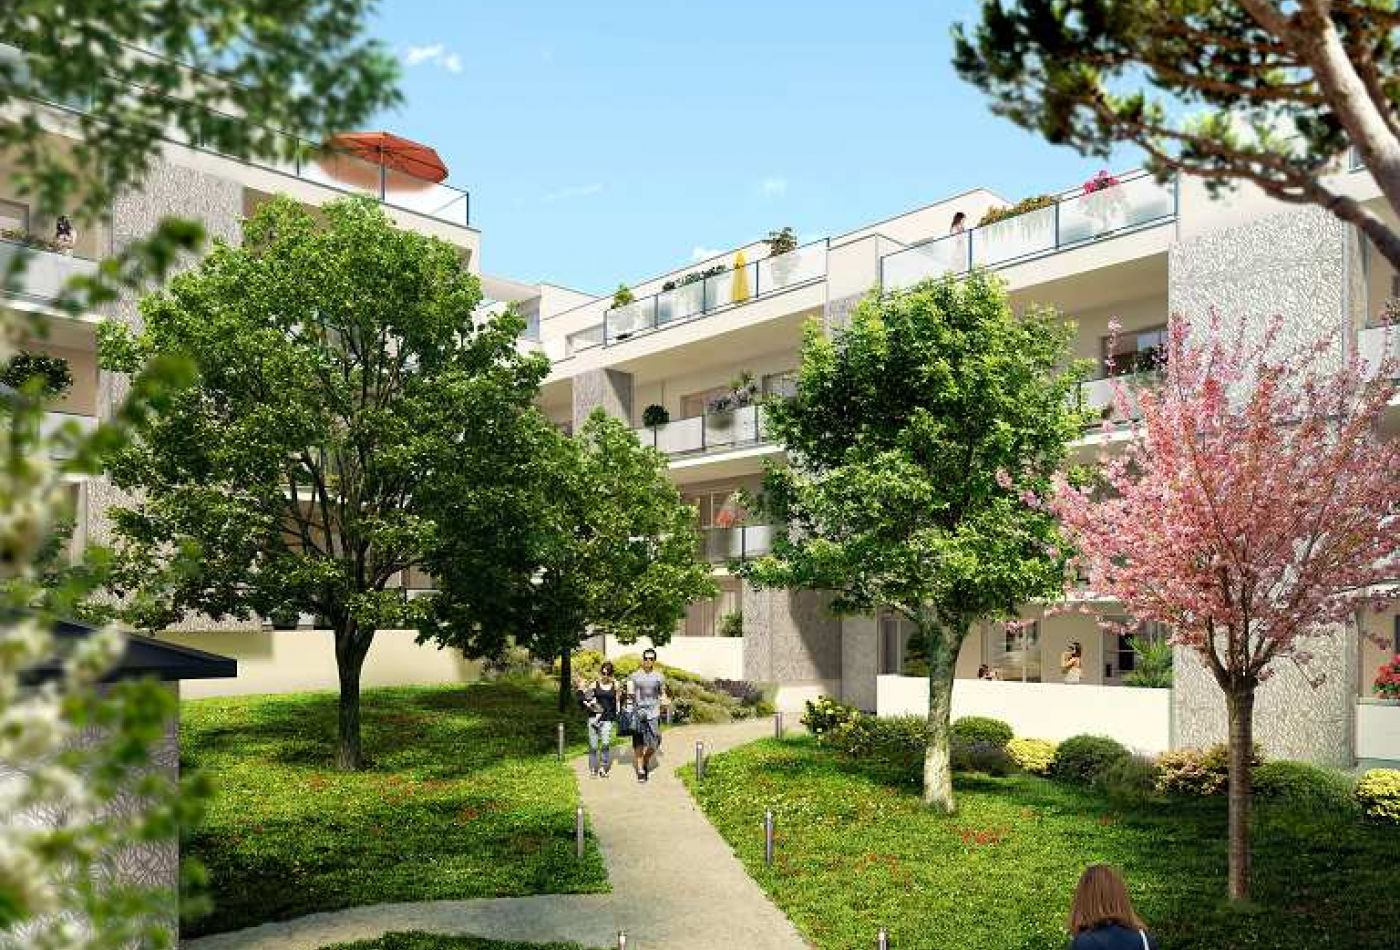 Programme immobilier oaky neuf saint jean de vedas argence immobilier - Saint jean de vedas tram ...